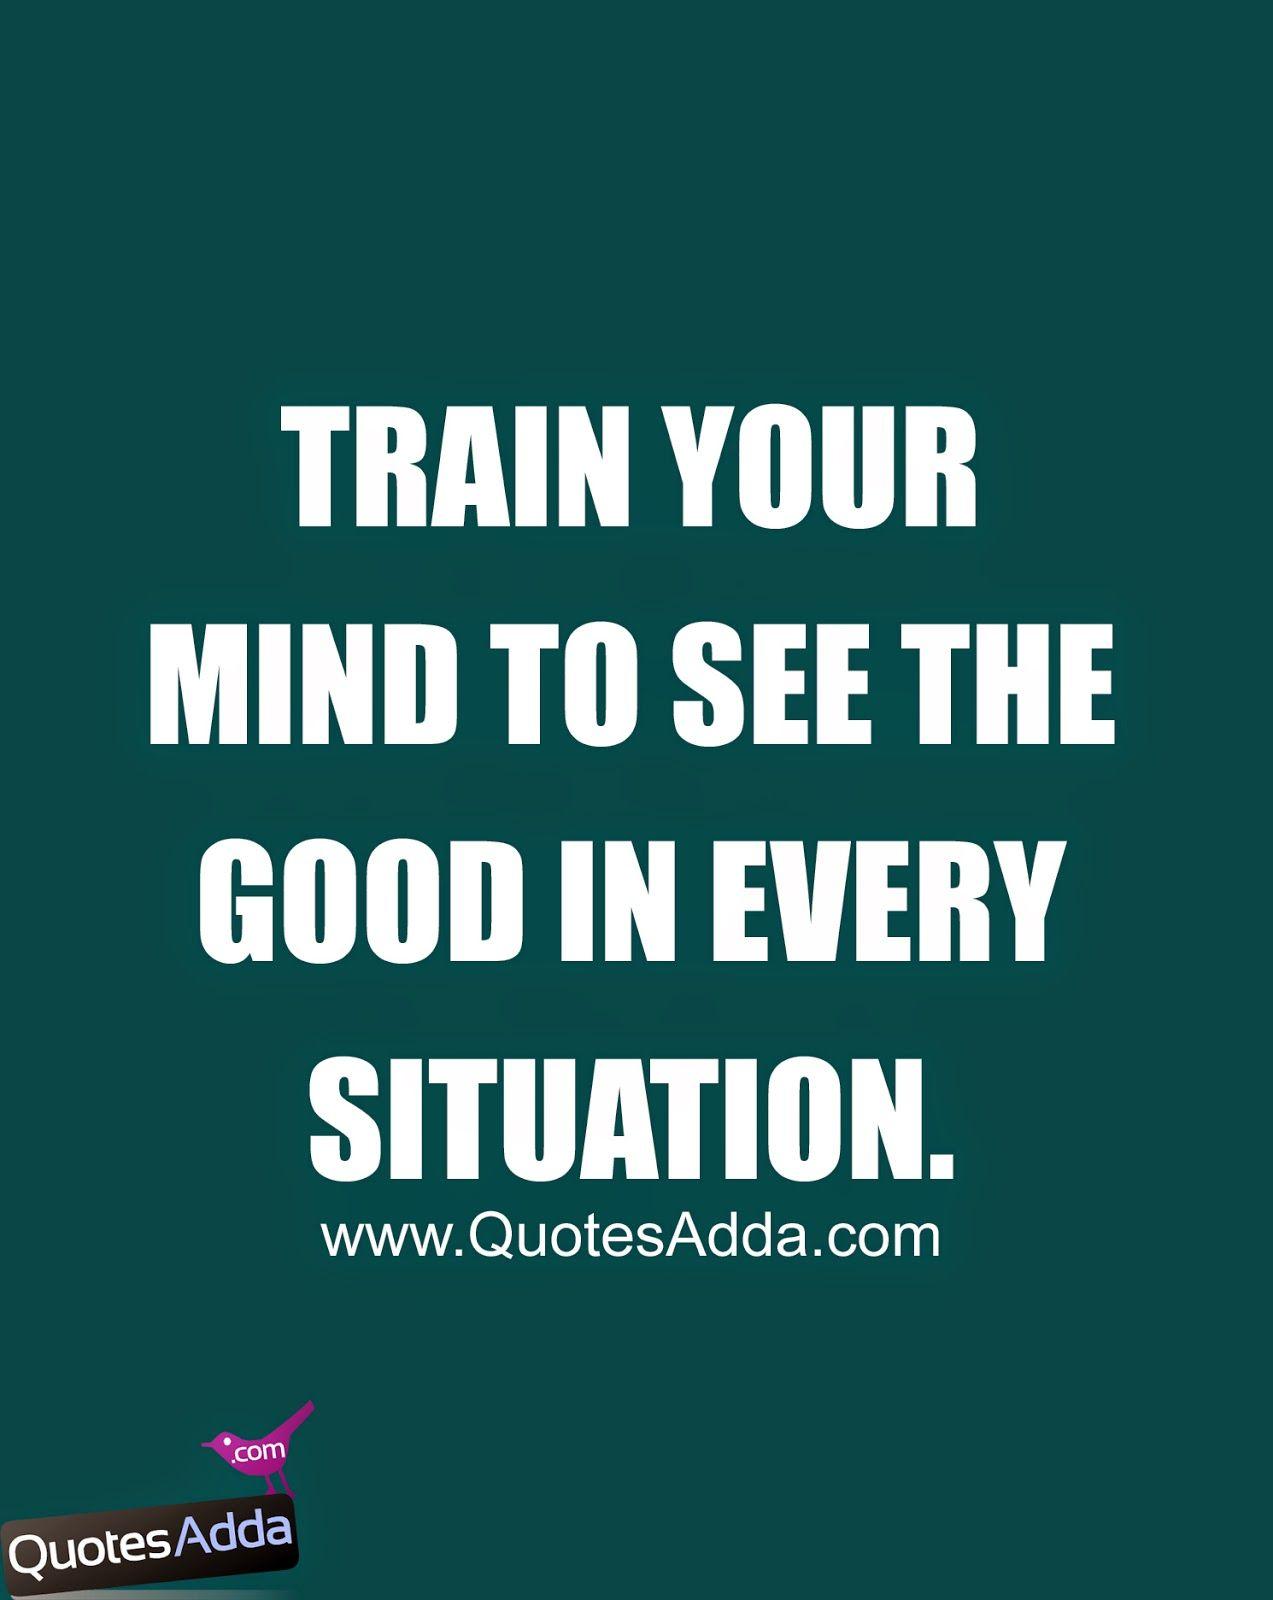 English Daily Good Life Quotations Quotesadda Com Telugu Quotes